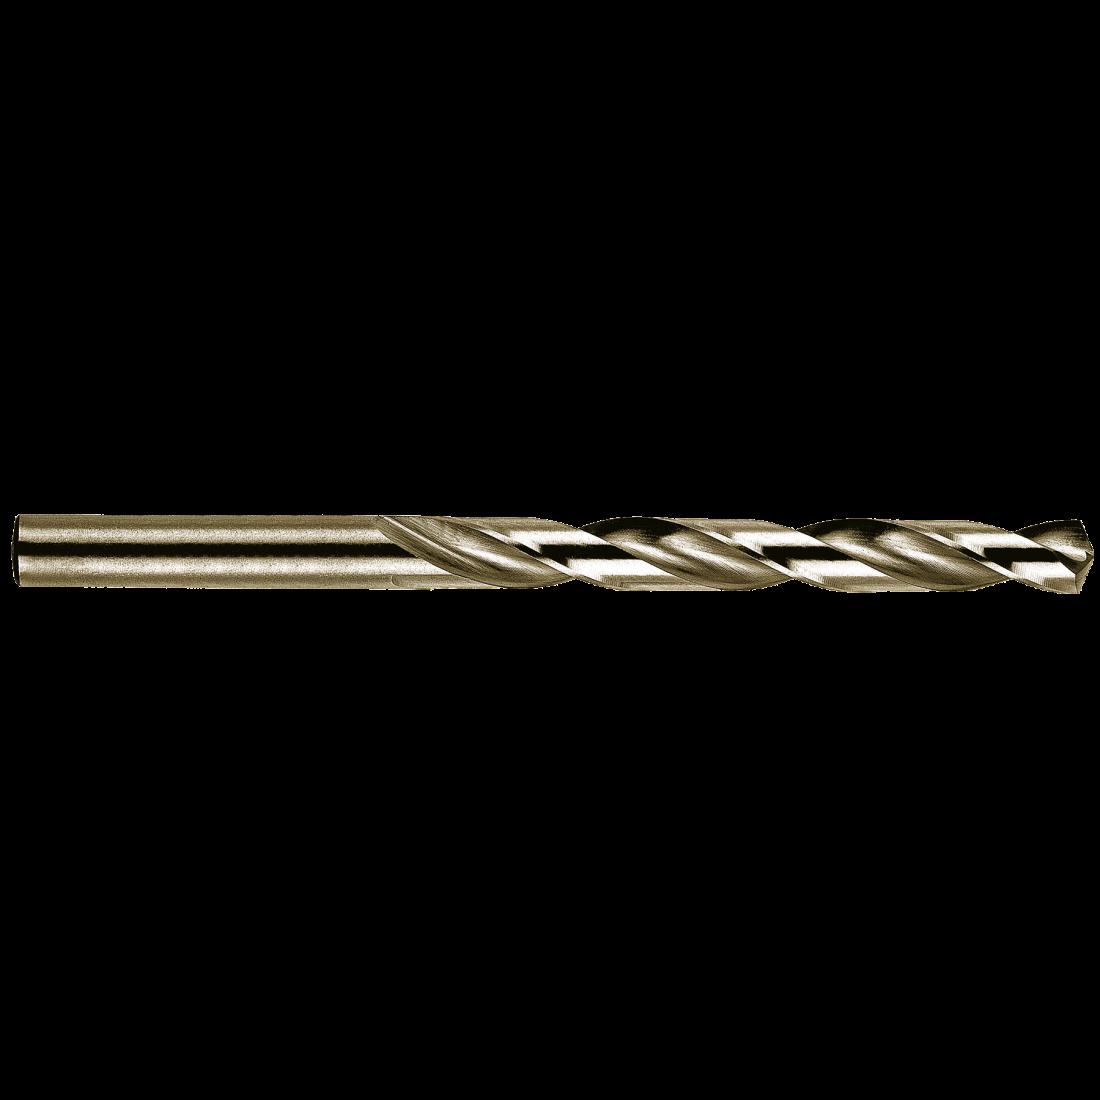 Сверло по металлу Heller НSS-Co DIN 338 RN  5,5x57x93мм (10шт)